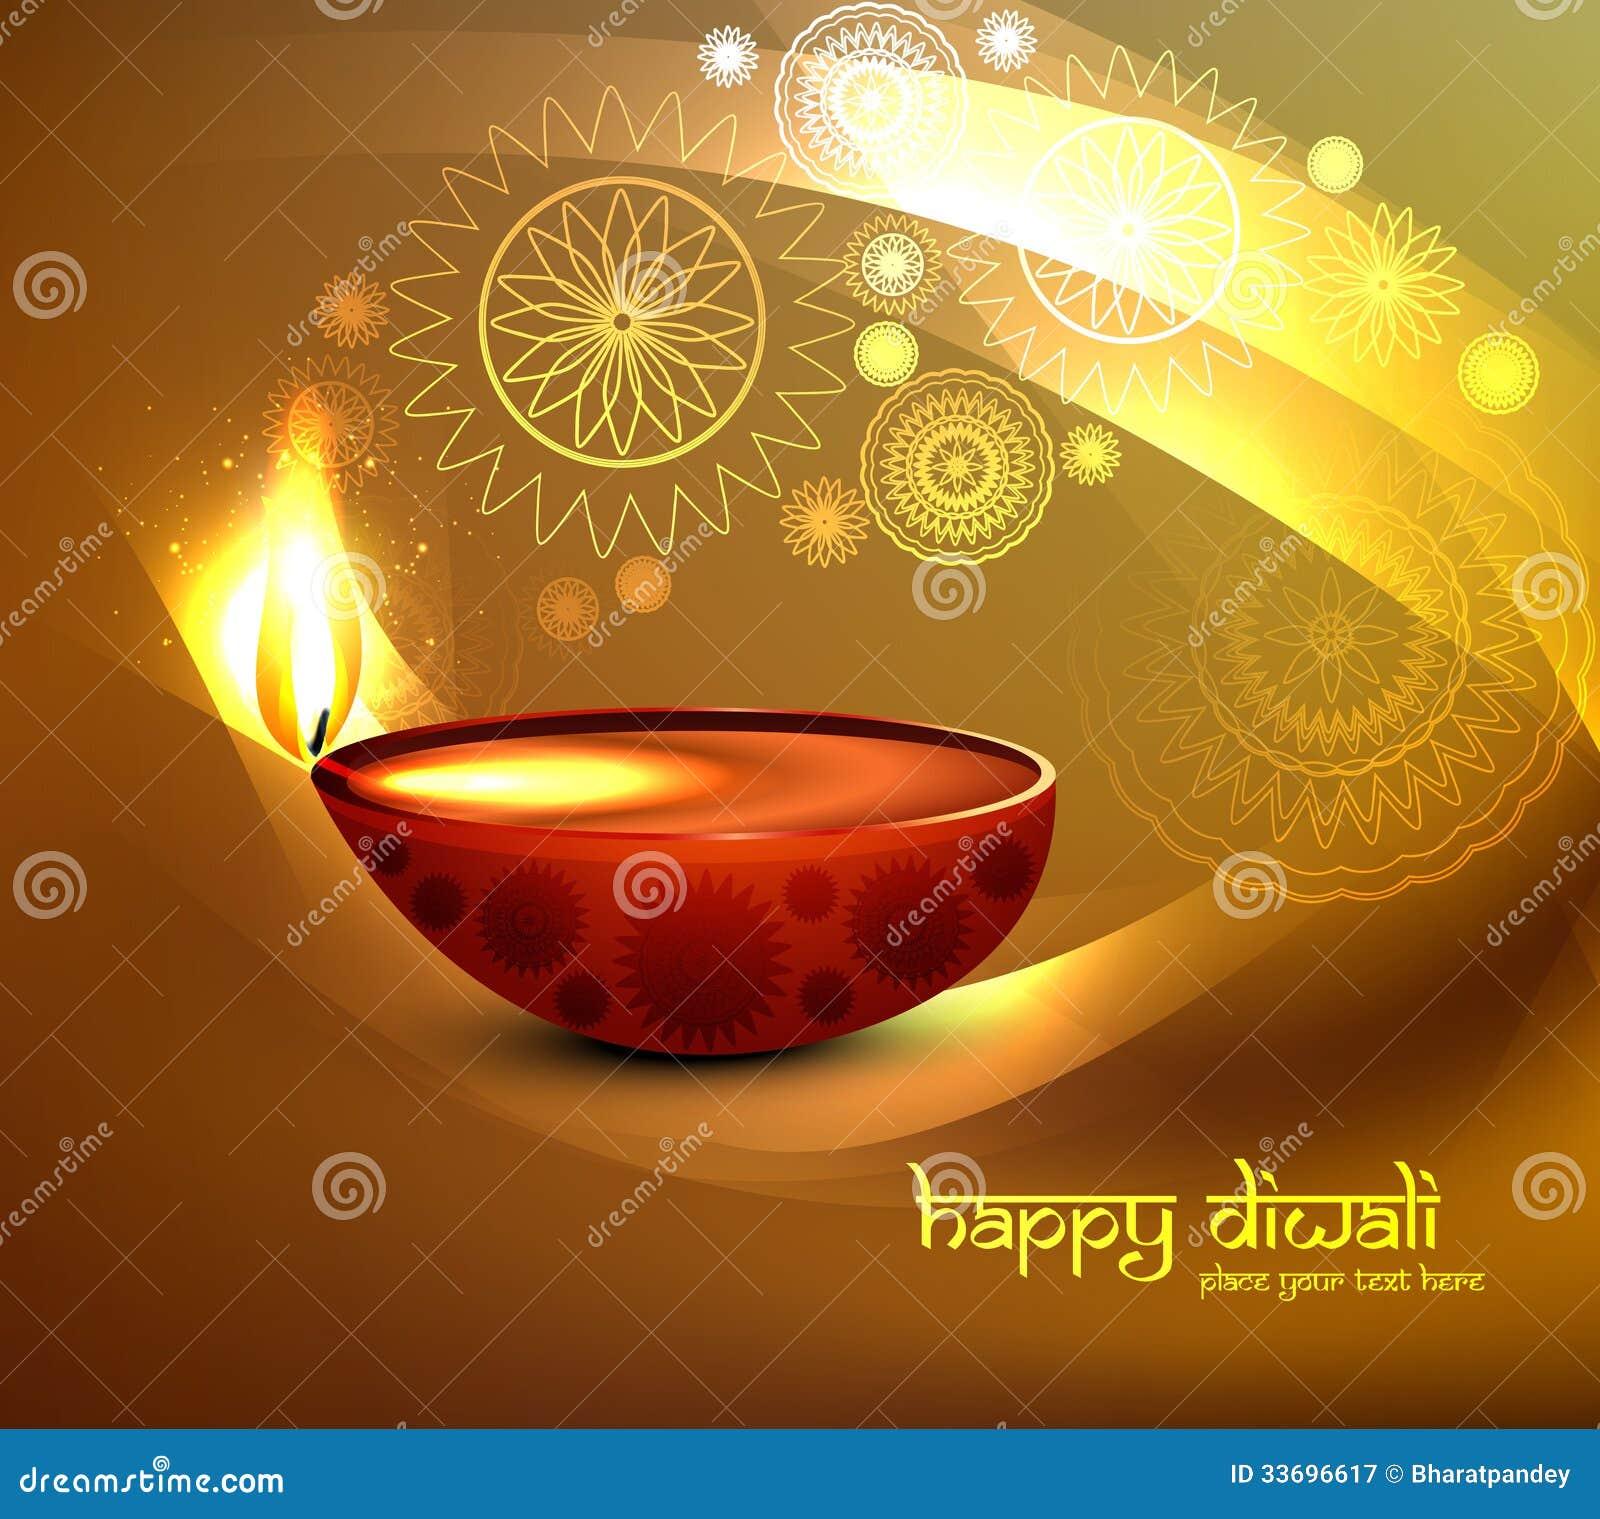 Beautiful illustration for happy diwali greeting c stock vector beautiful illustration for happy diwali greeting card bright colorful background m4hsunfo